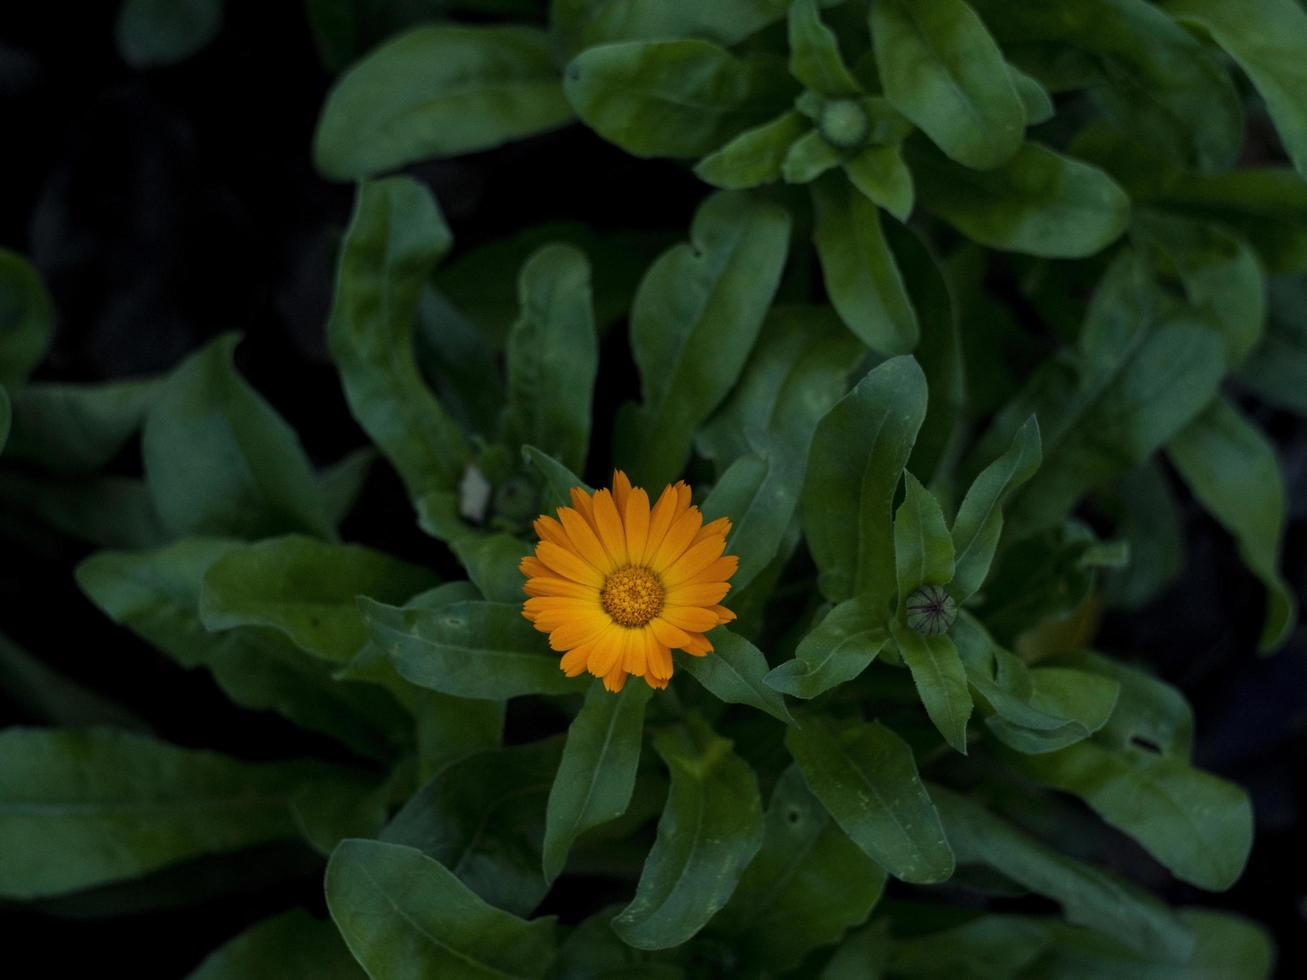 belle petite fleur orange photo